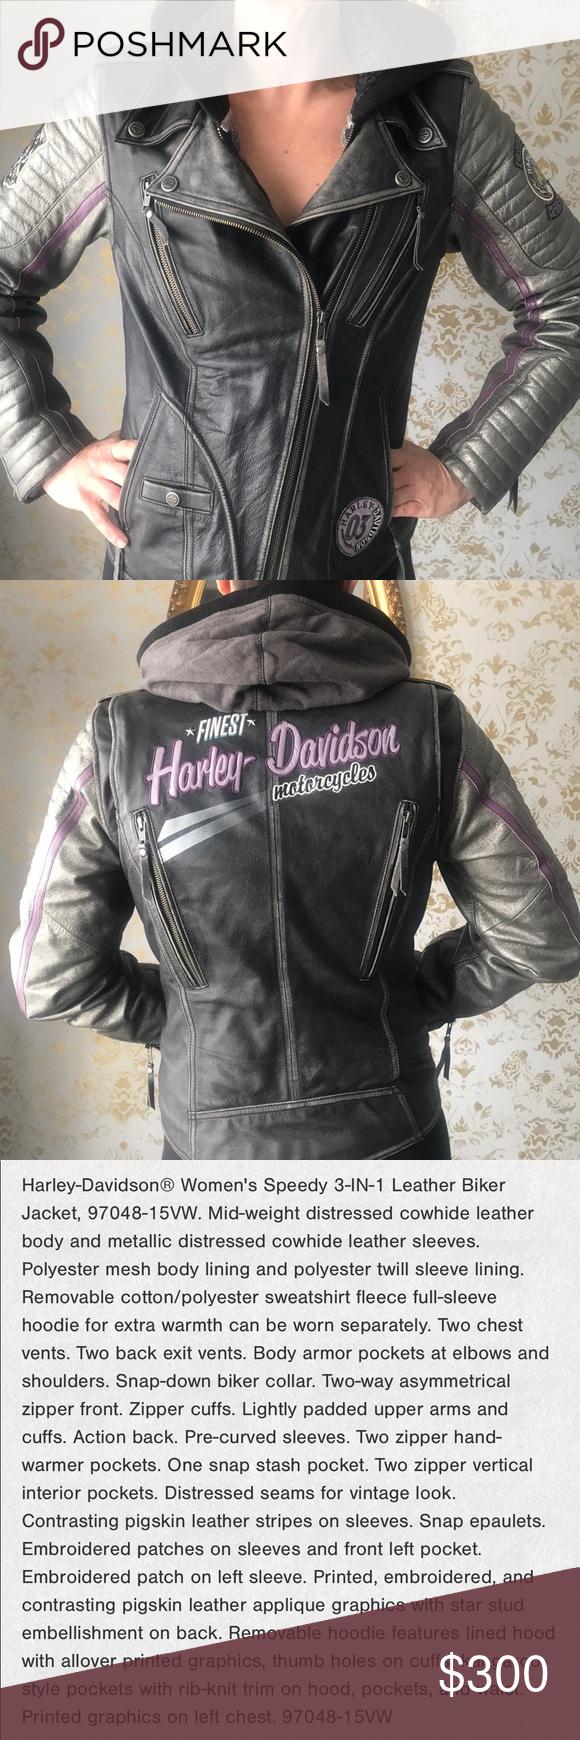 Harley Davidson 3 In 1 Leather Jacket Leather Jacket Jackets Asymmetrical Zipper [ 1740 x 580 Pixel ]